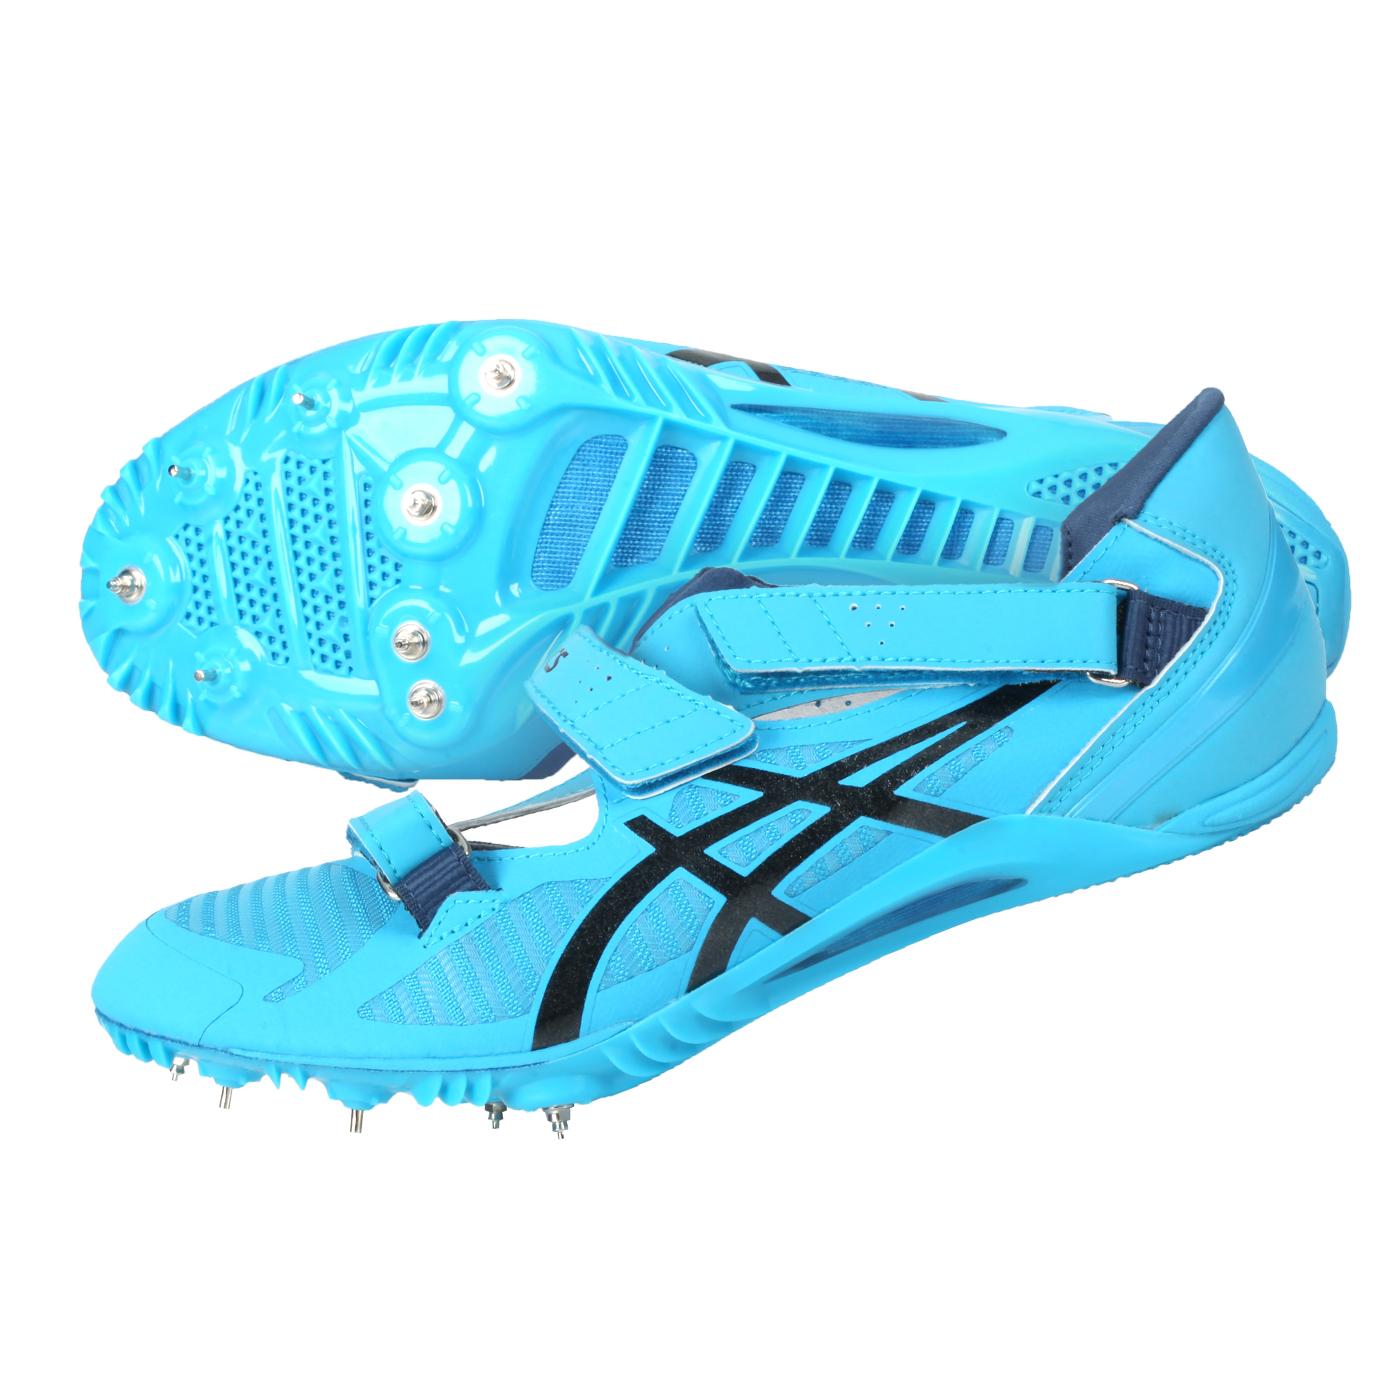 ASICS 男女田徑釘鞋(短距離)  @CYBERBLADE 16@1093A134-402 - 藍水藍